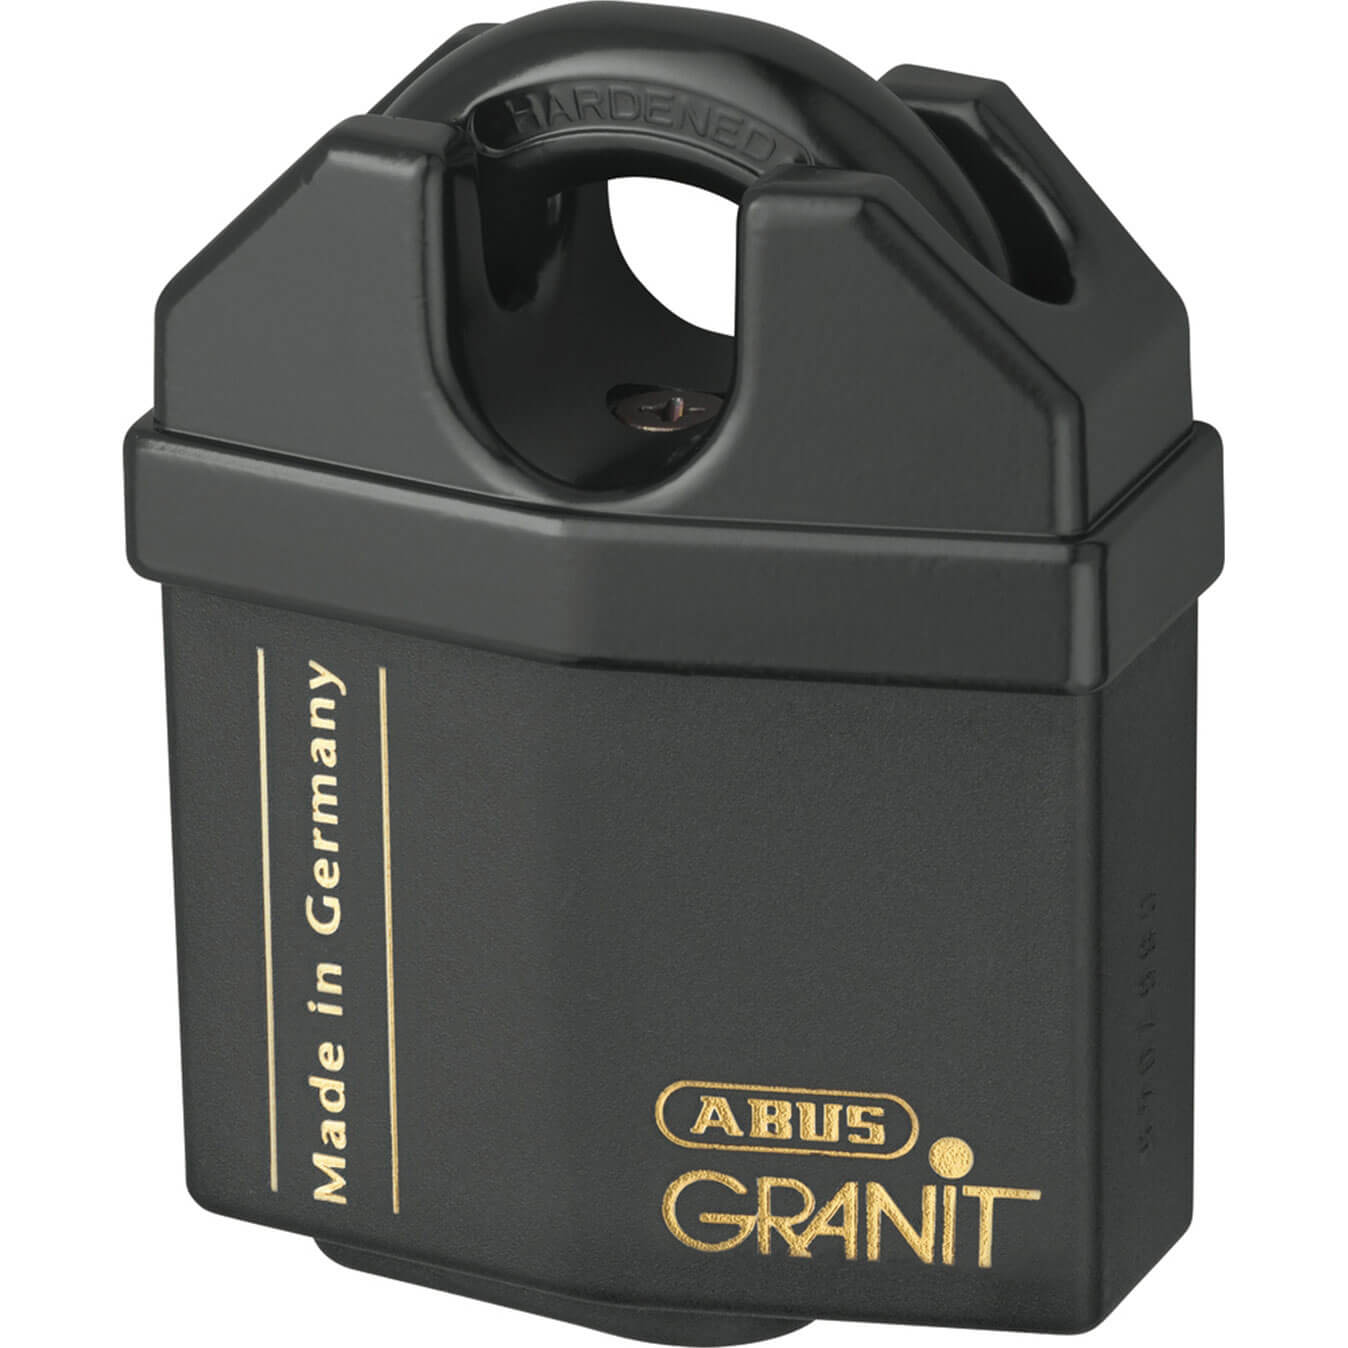 Abus 60mm 37 Series Granit Hardened Steel Padlock Rekeyable